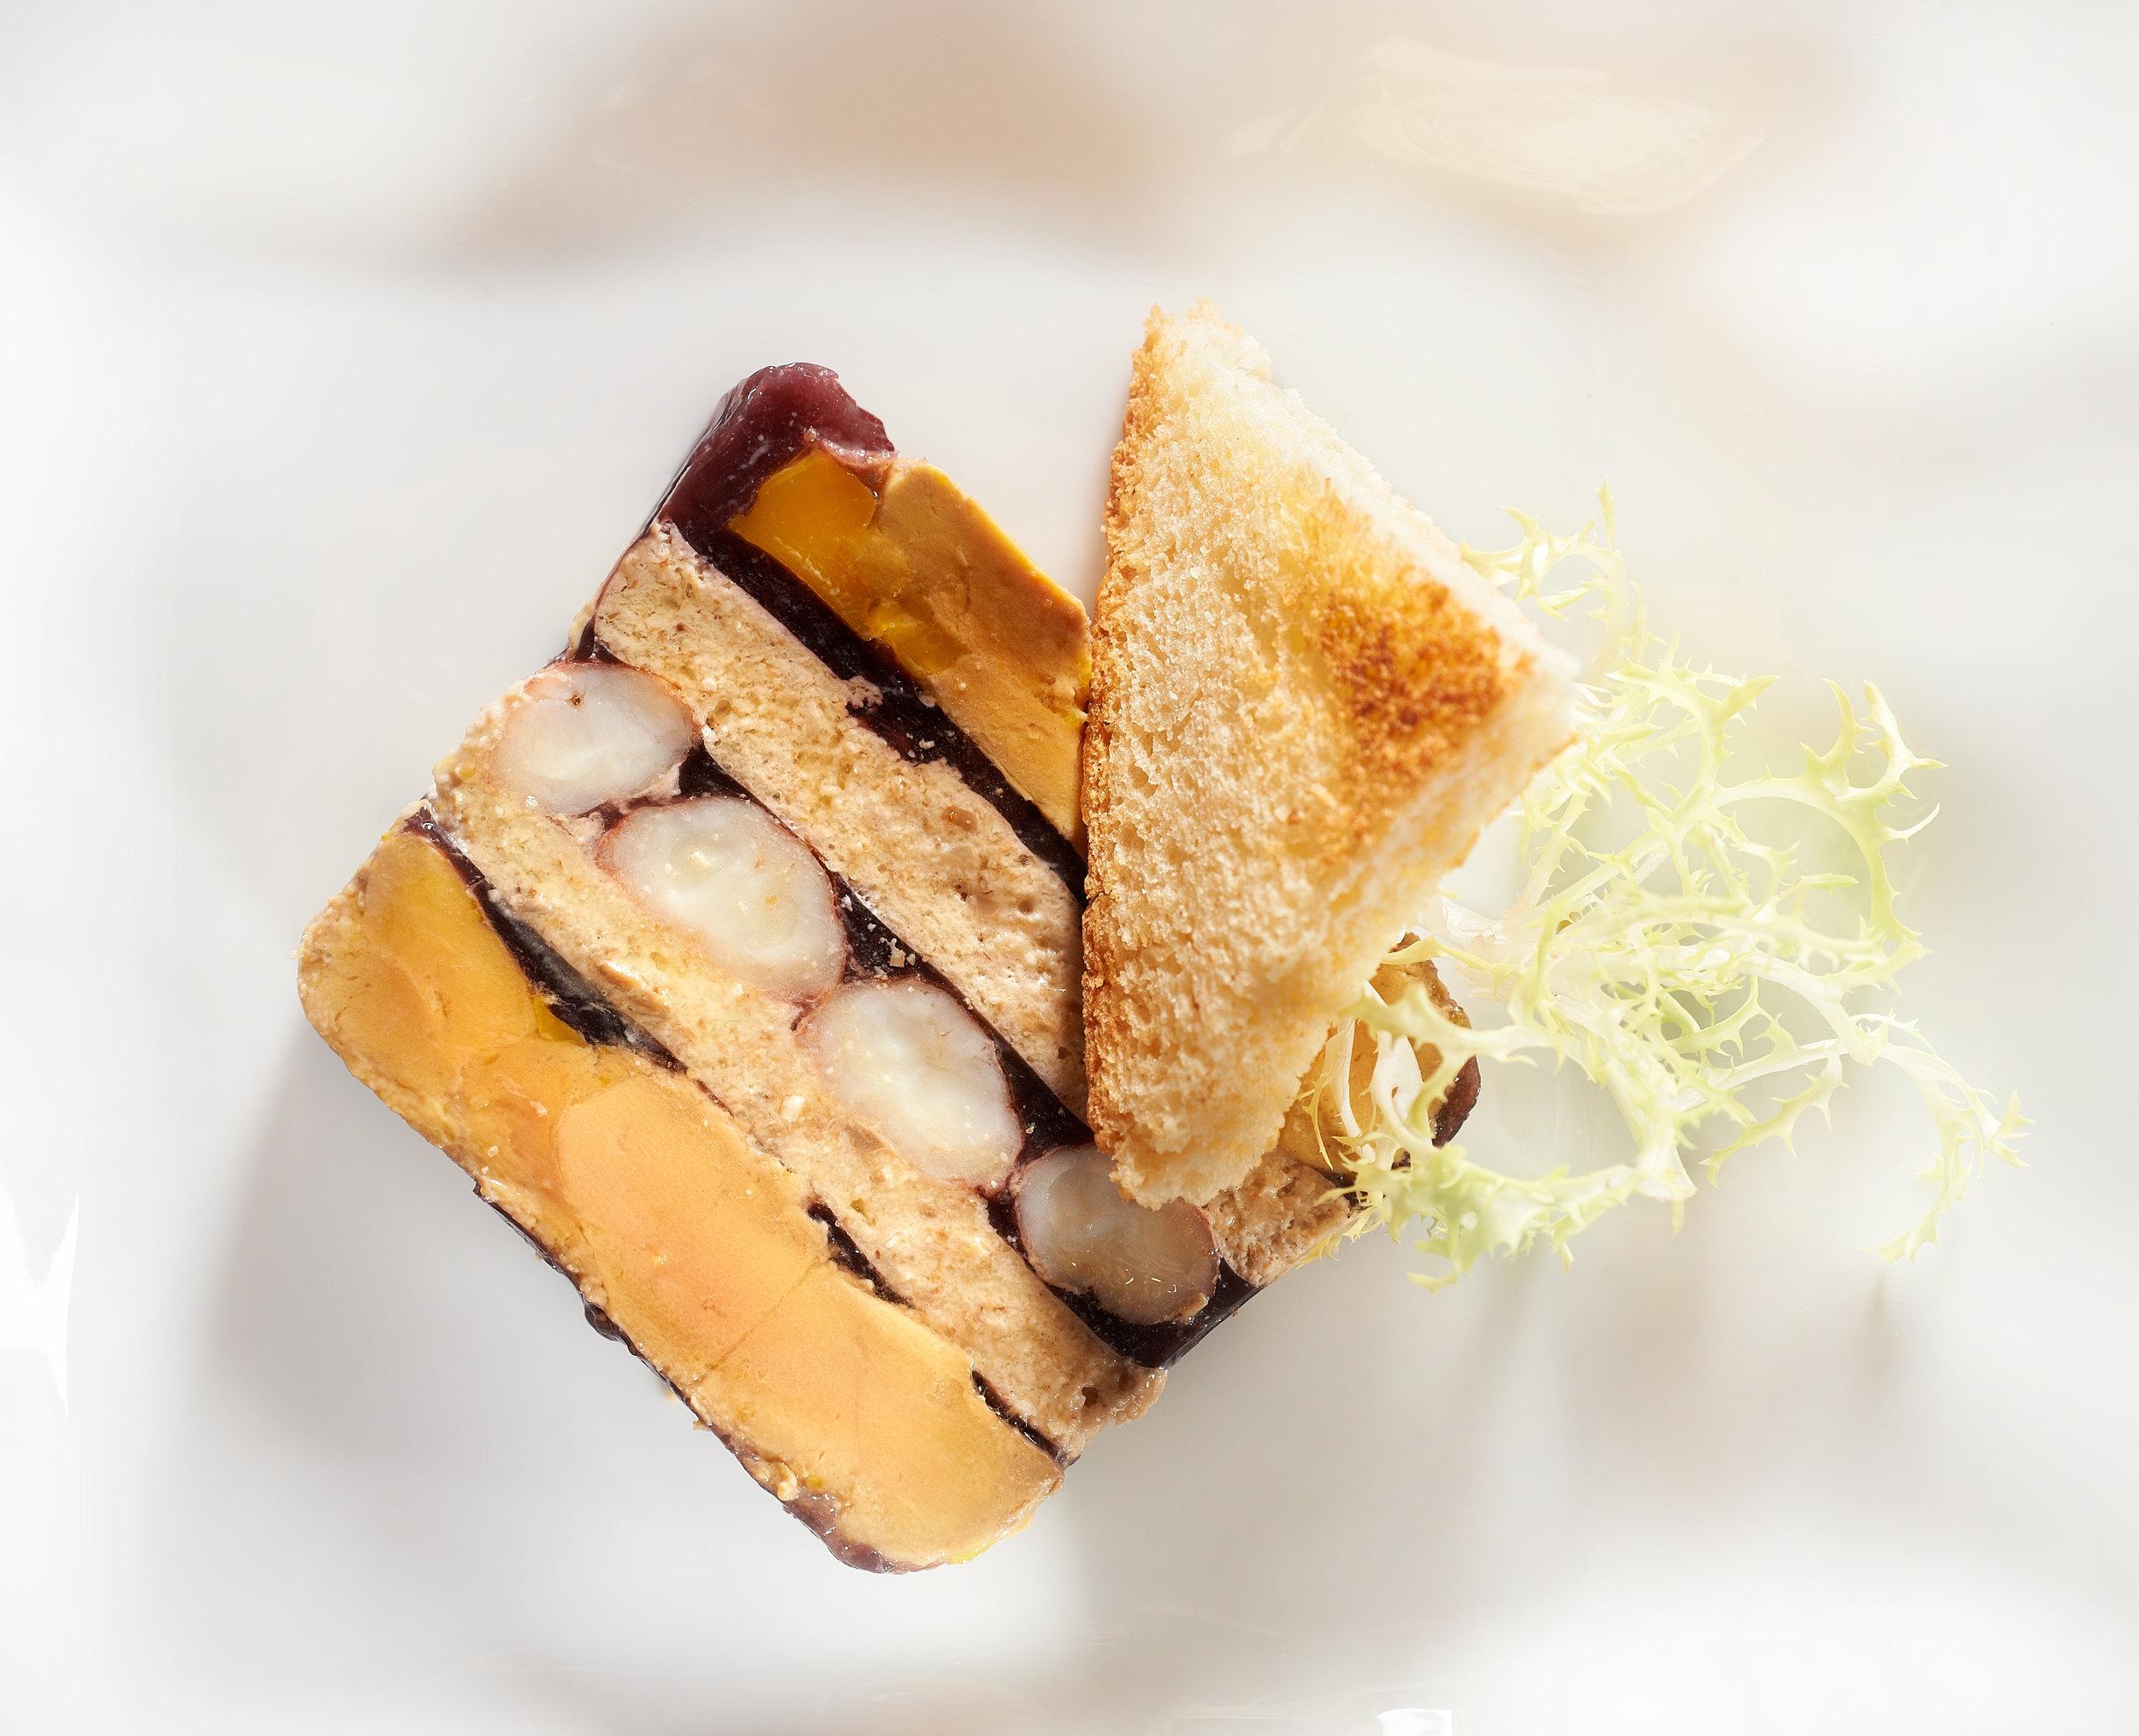 terrine foie gras et langoustine.jpg